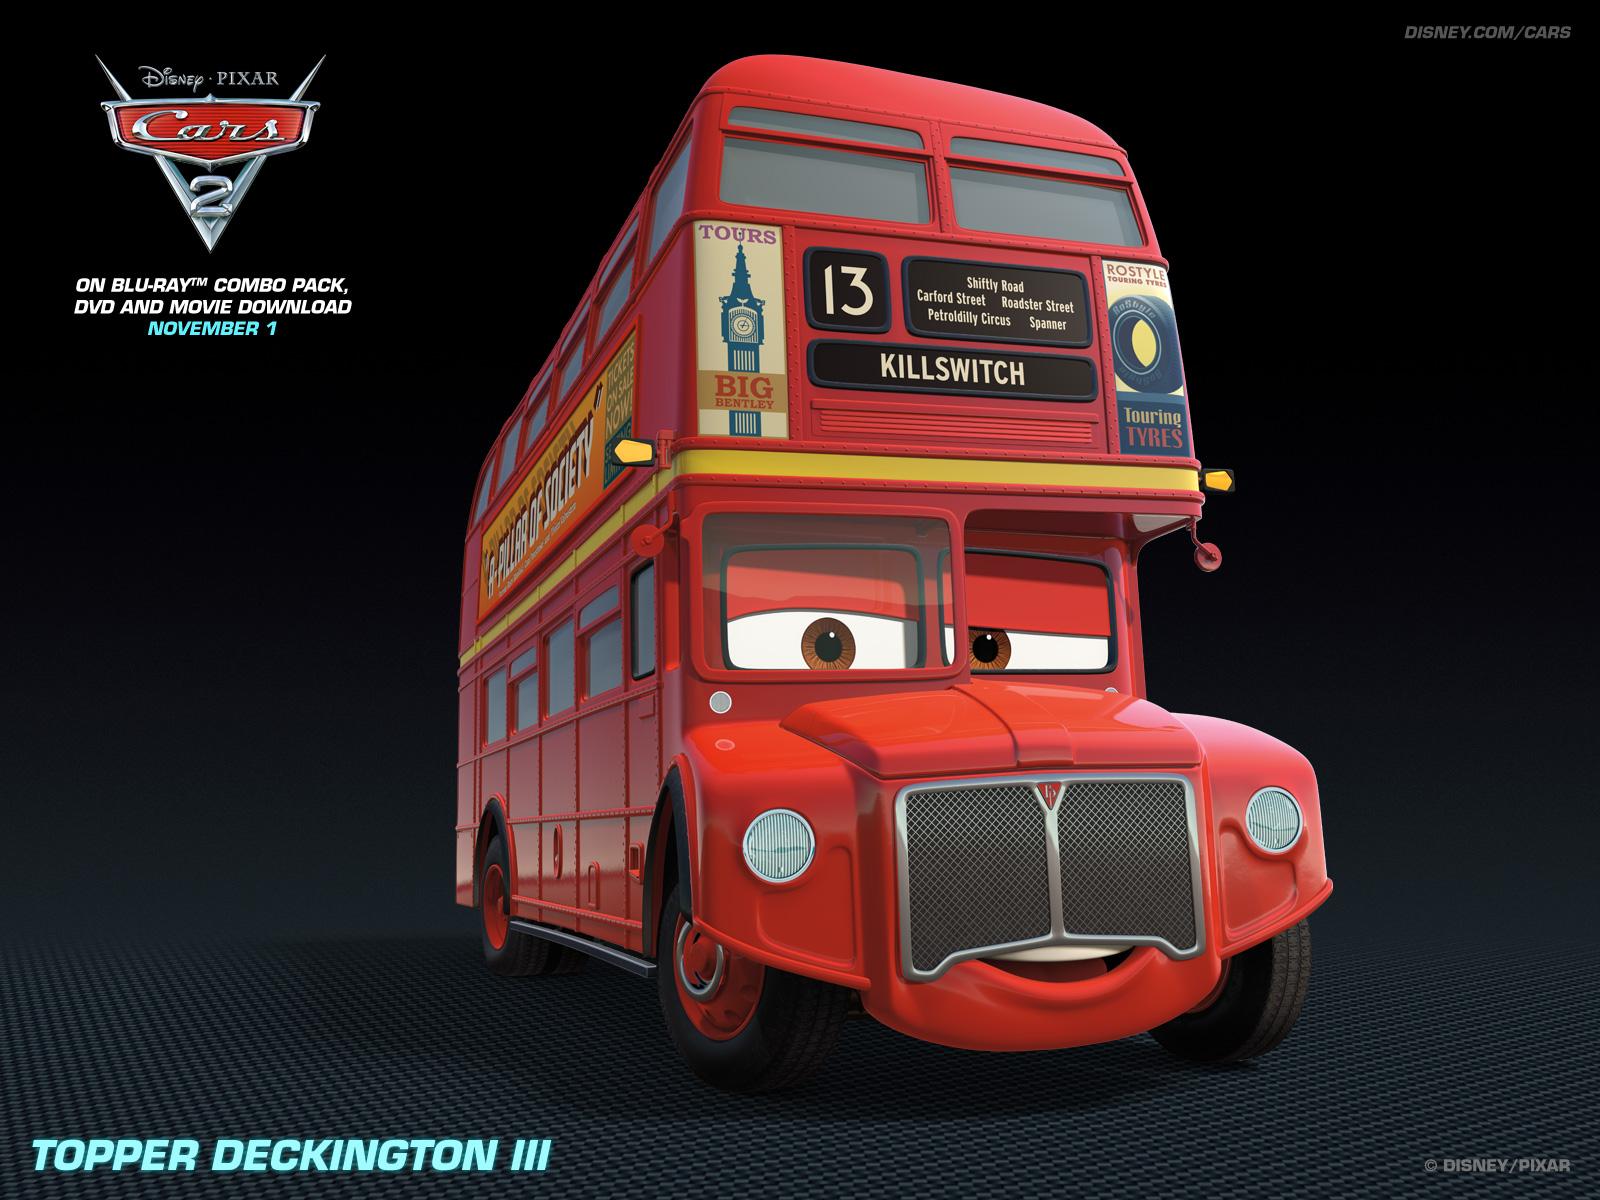 Disney Pixar Cars 2 images Topper Deckington wallpaper photos 1600x1200